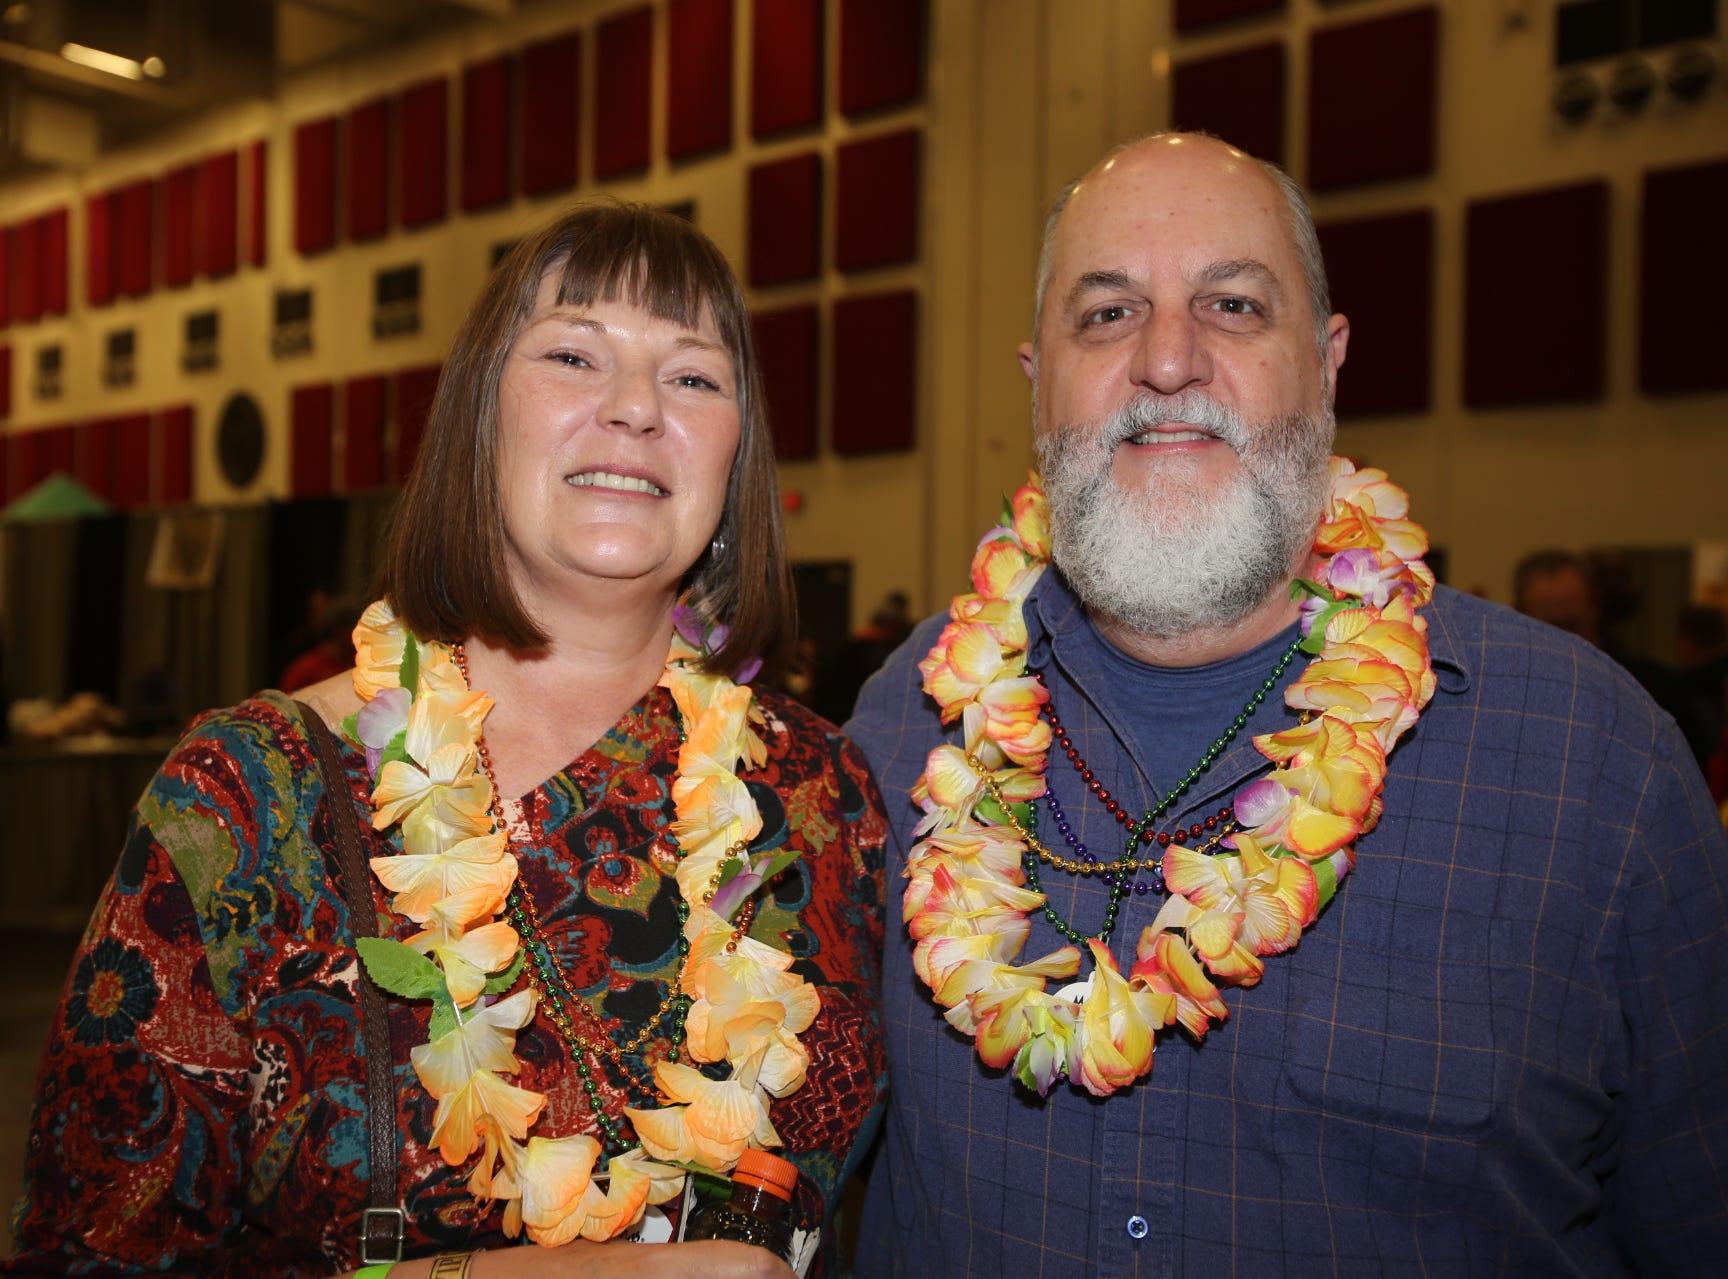 Linda Bybee and Eric Johnson